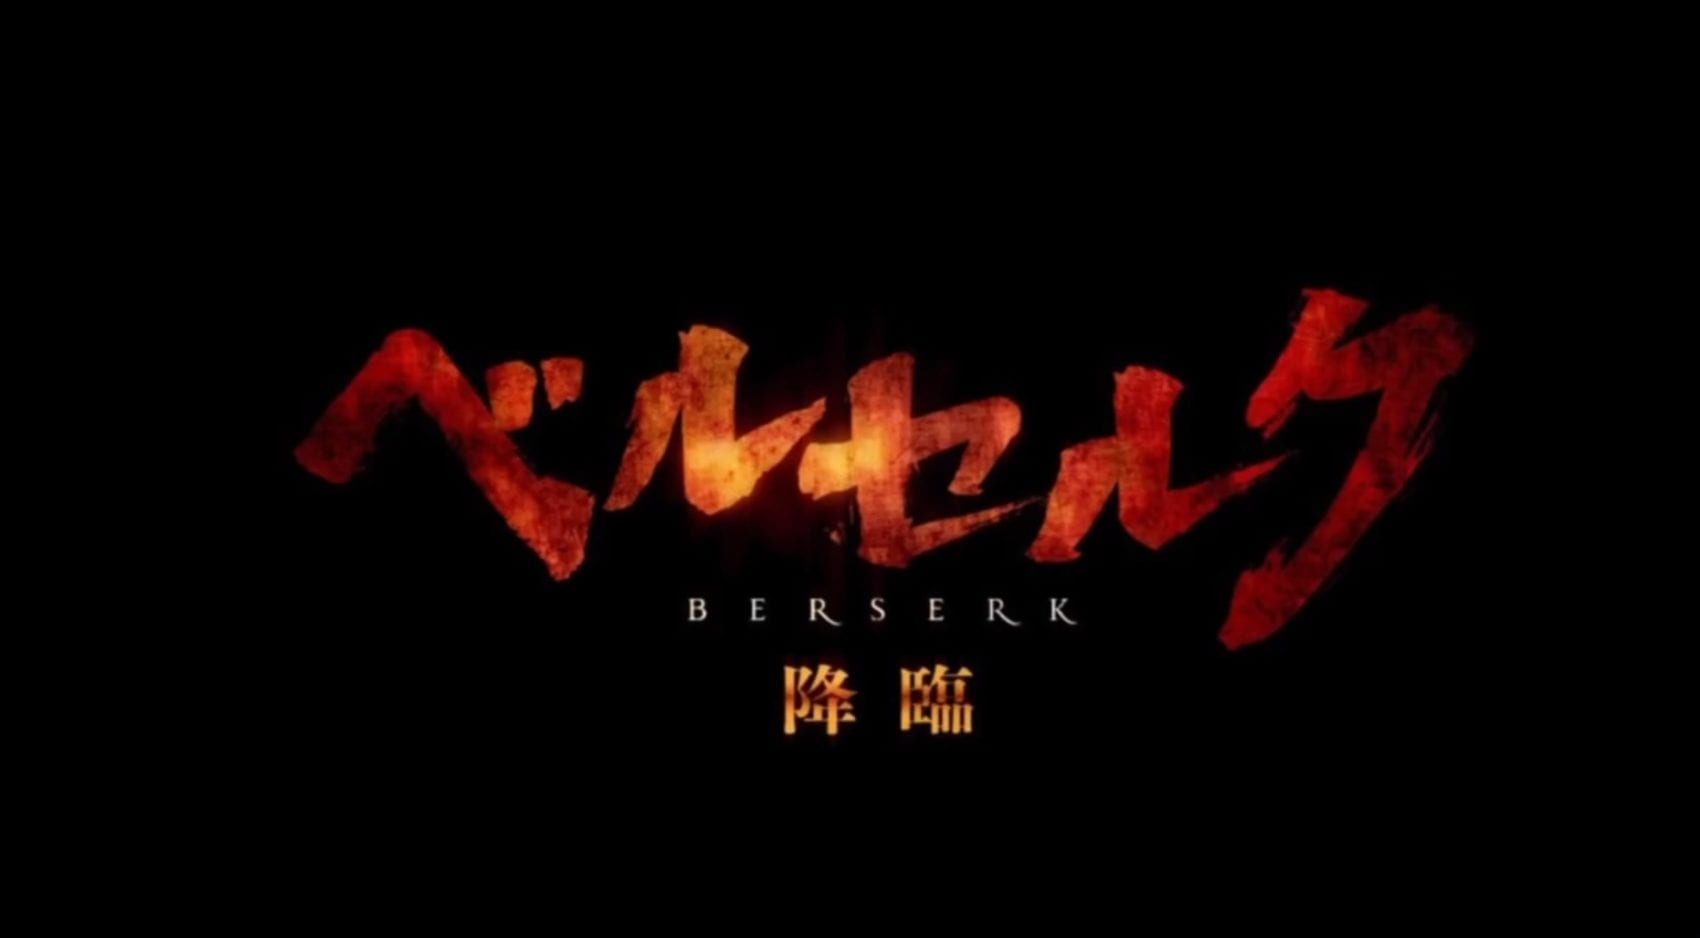 REVIEW – Berserk